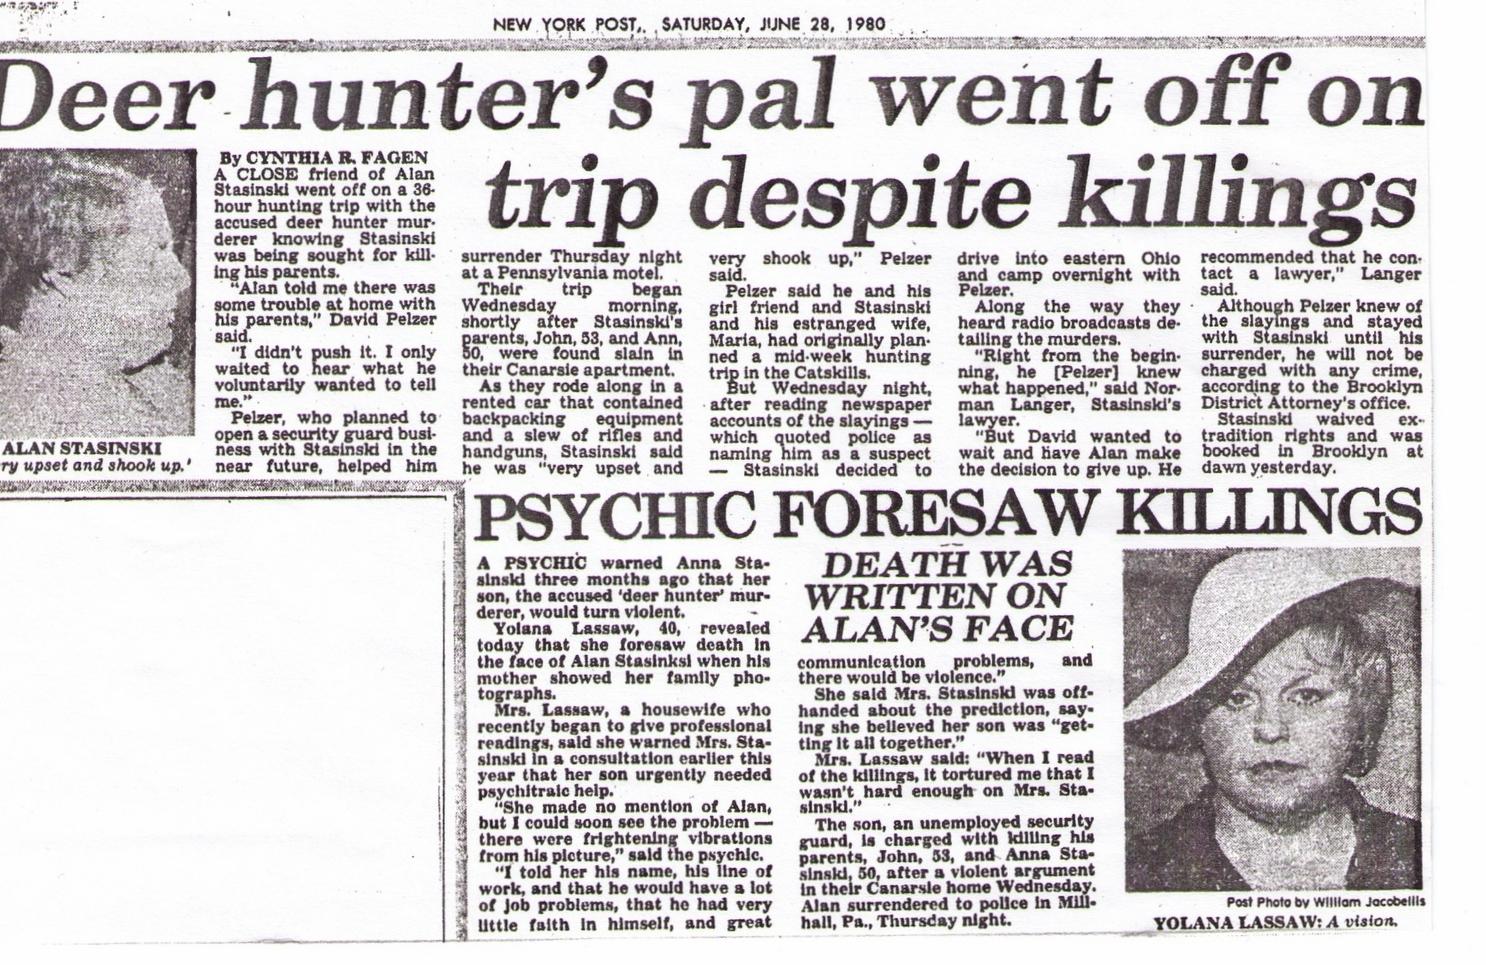 Yolana's New York Post, June 28Th 1980 Article